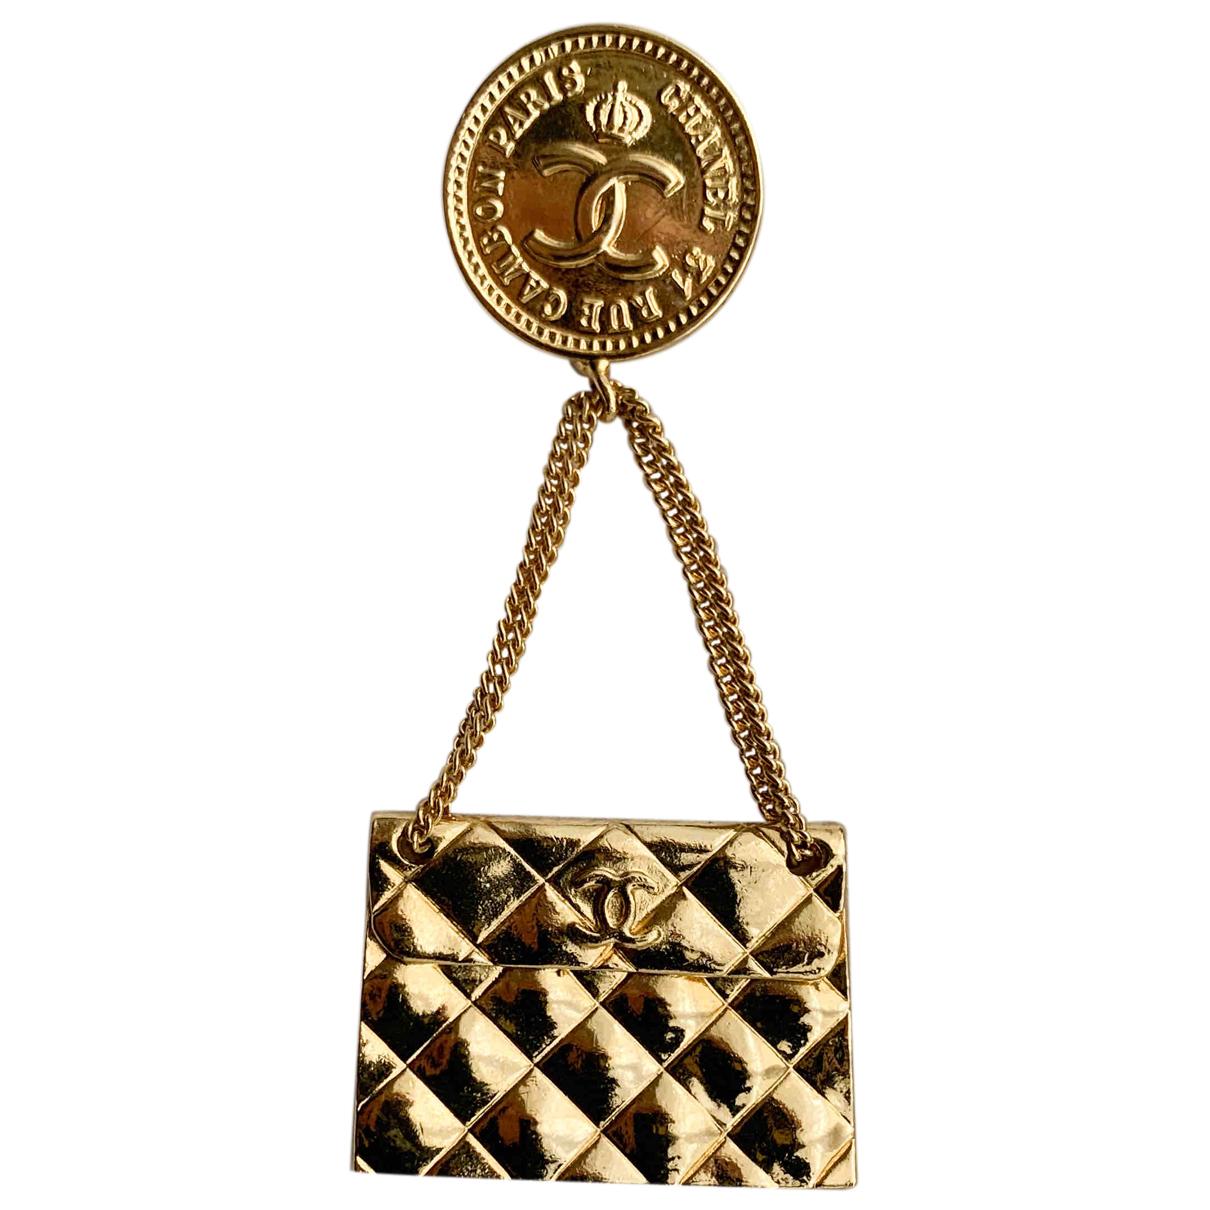 Broche Matelasse en Metal Dorado Chanel